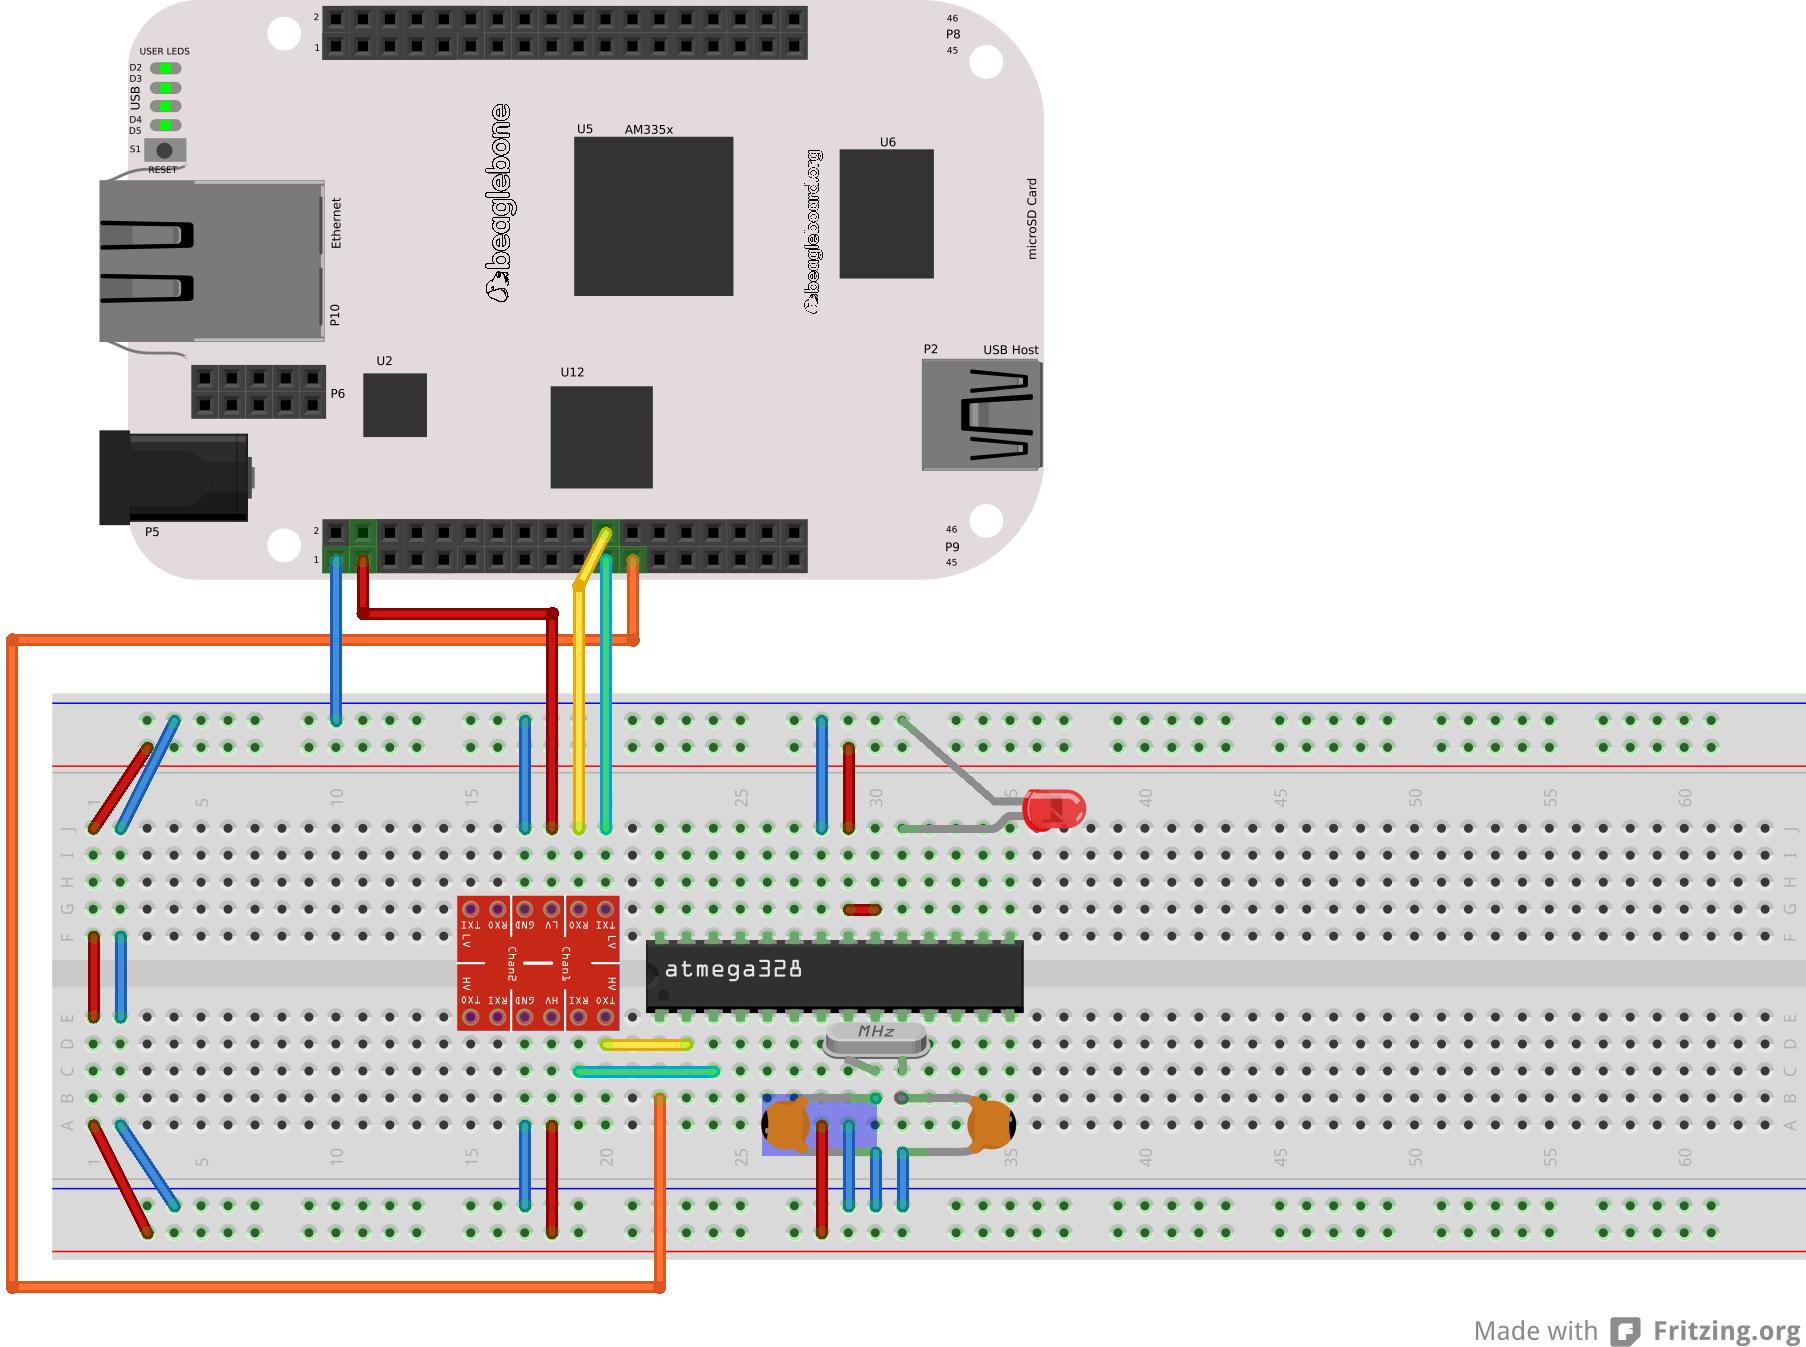 Program An Arduino Using Beaglebone Without Usb 5 Steps 555watchdogtimercircuit Digital Logic Purpose Of Diode In This 555